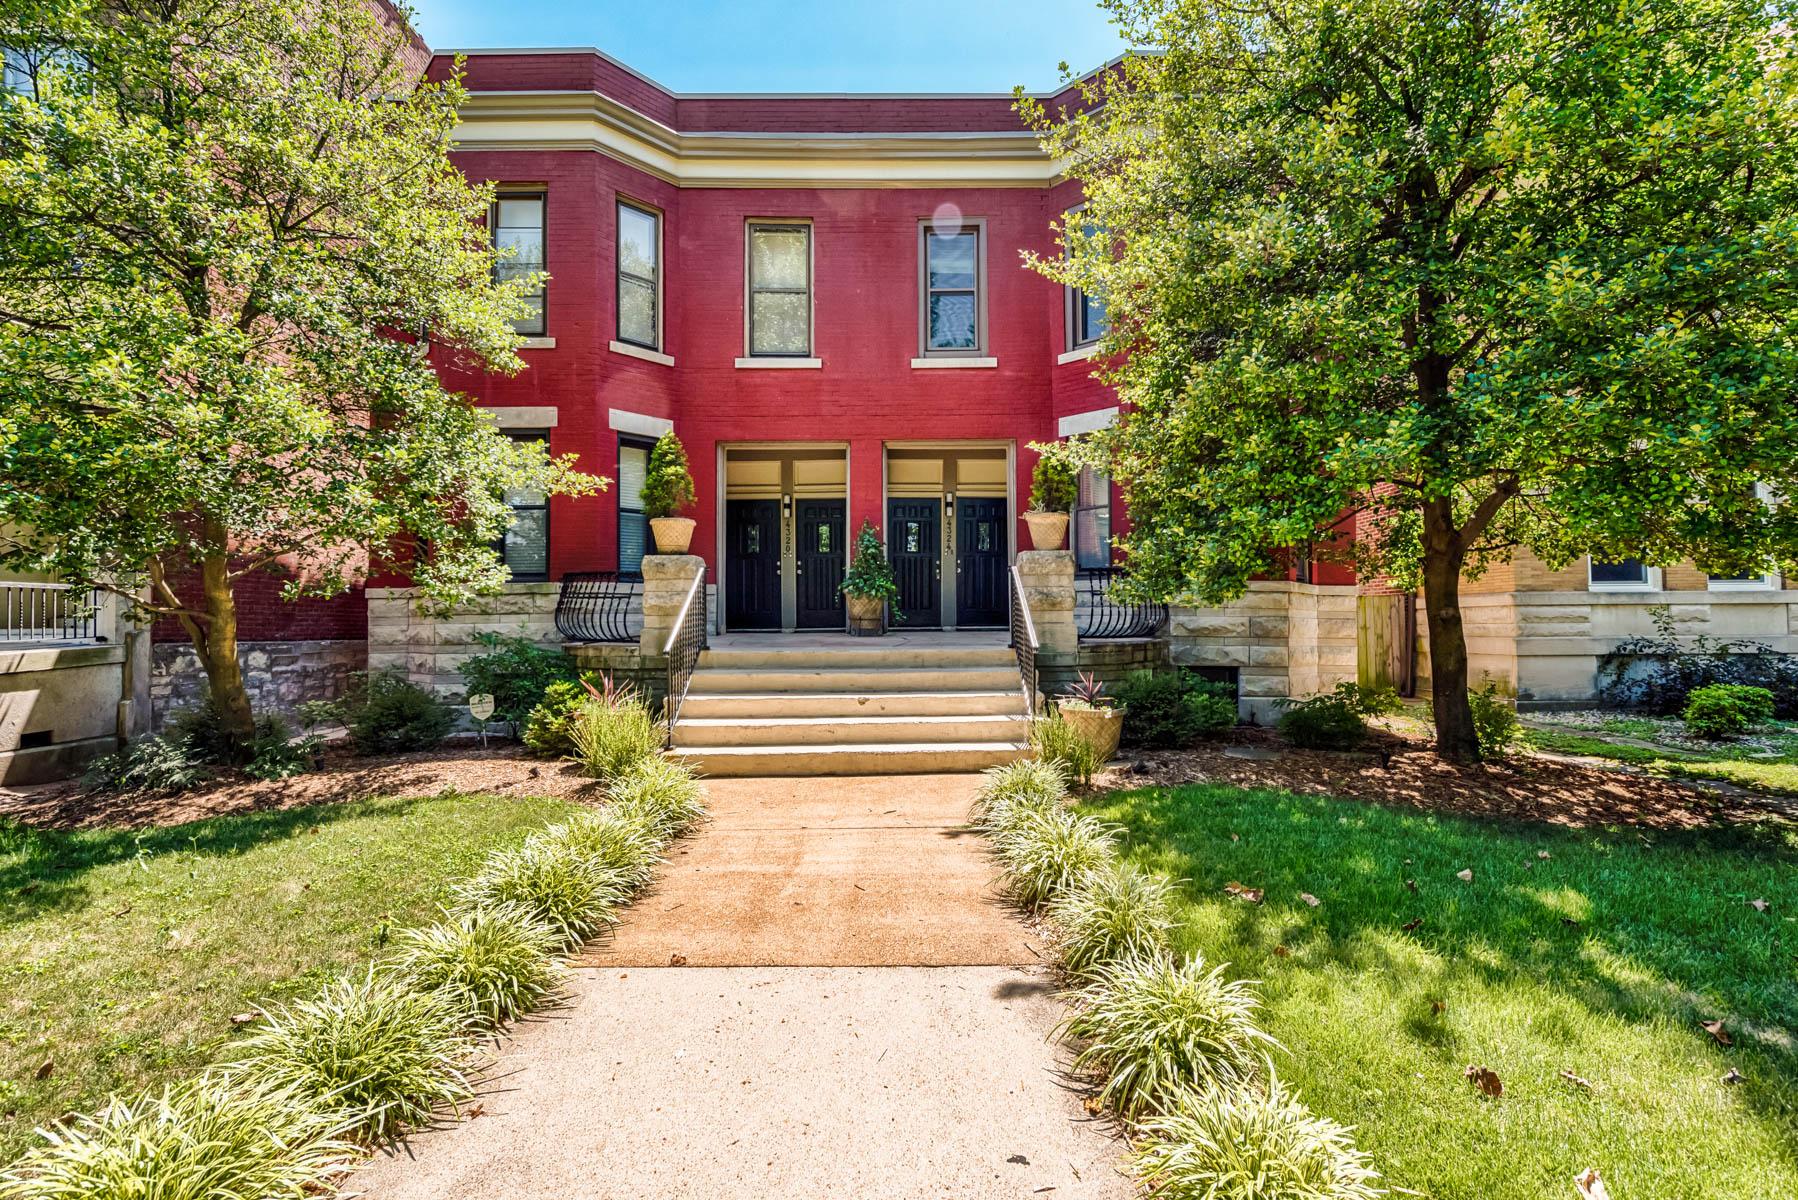 Condominium for Sale at West Pine #A 4324 West Pine #A St. Louis, Missouri 63108 United States